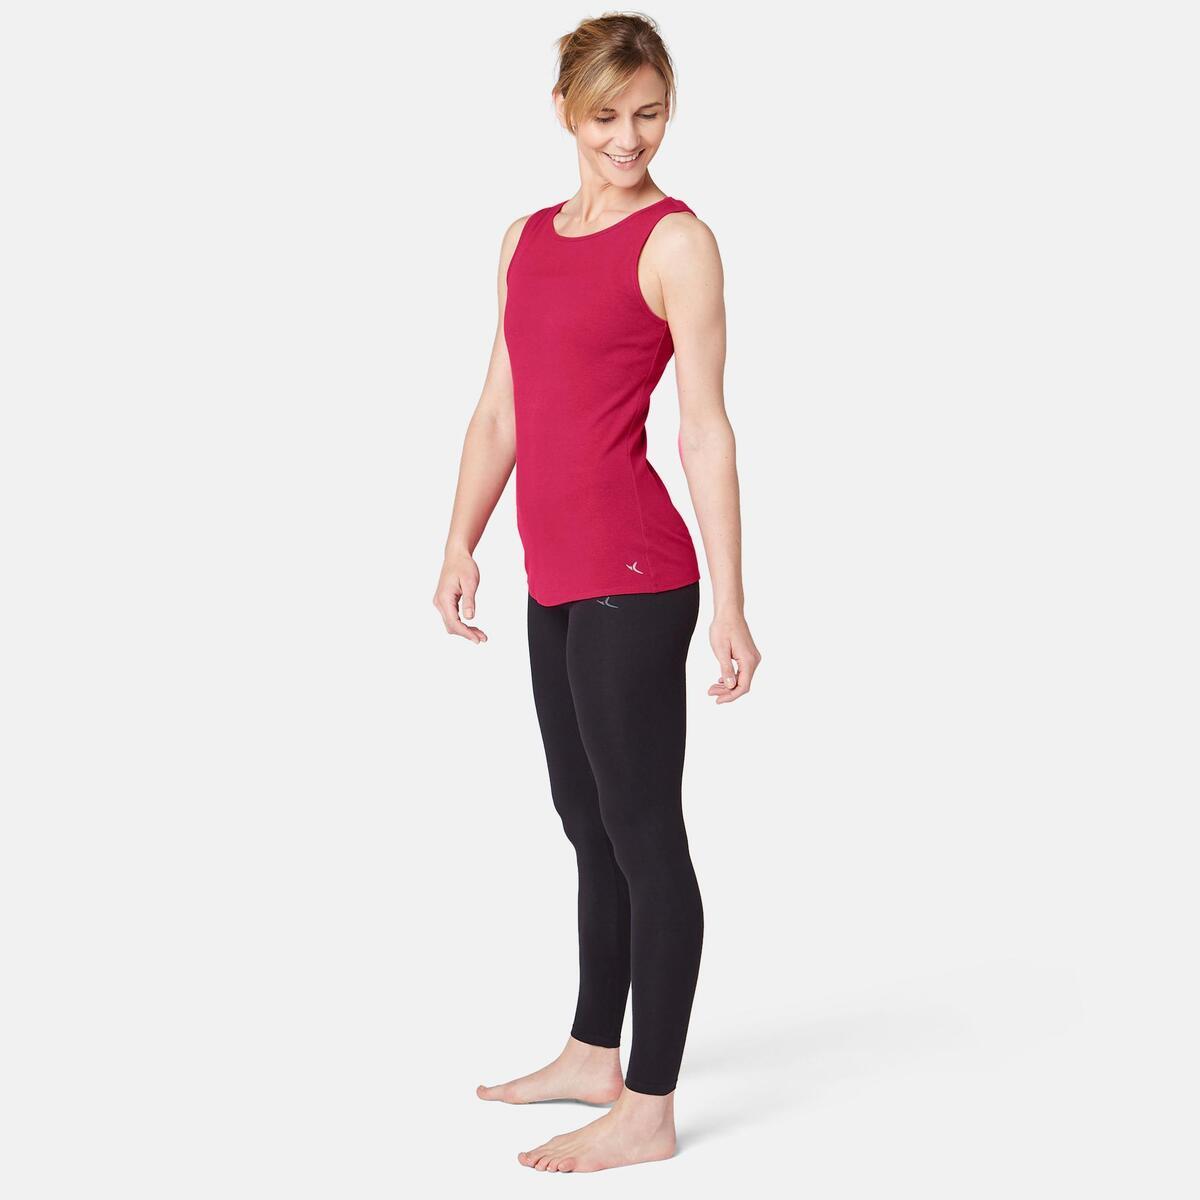 Bild 2 von Tank-Top 500 Pilates & sanfte Gymnastik Damen bordeaux meliert